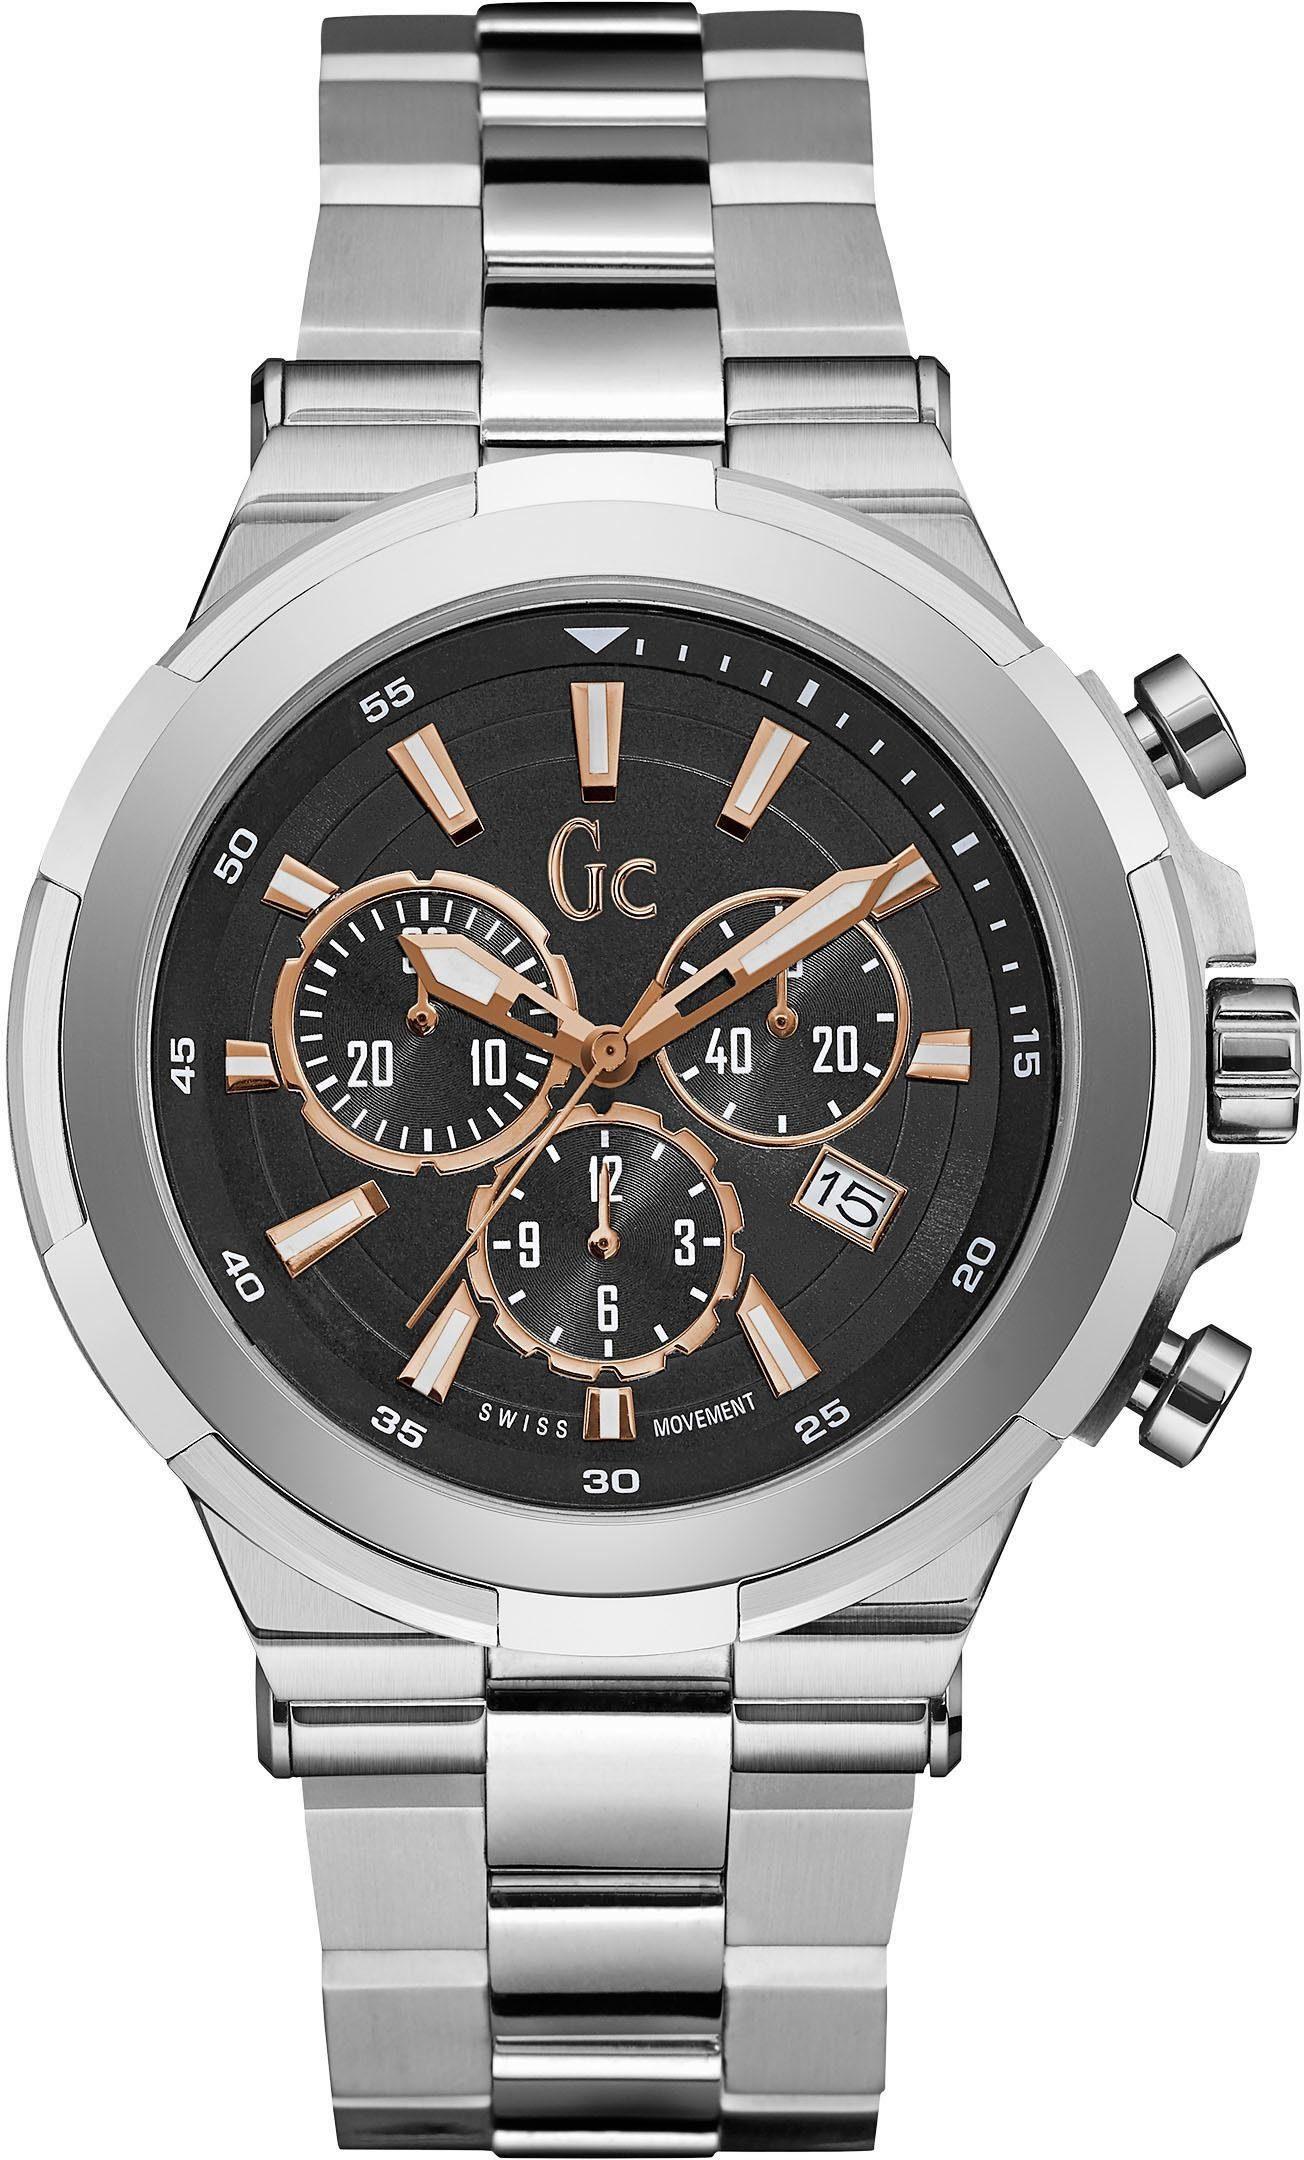 GC Chronograph »Gc Structura, Y23002G2«